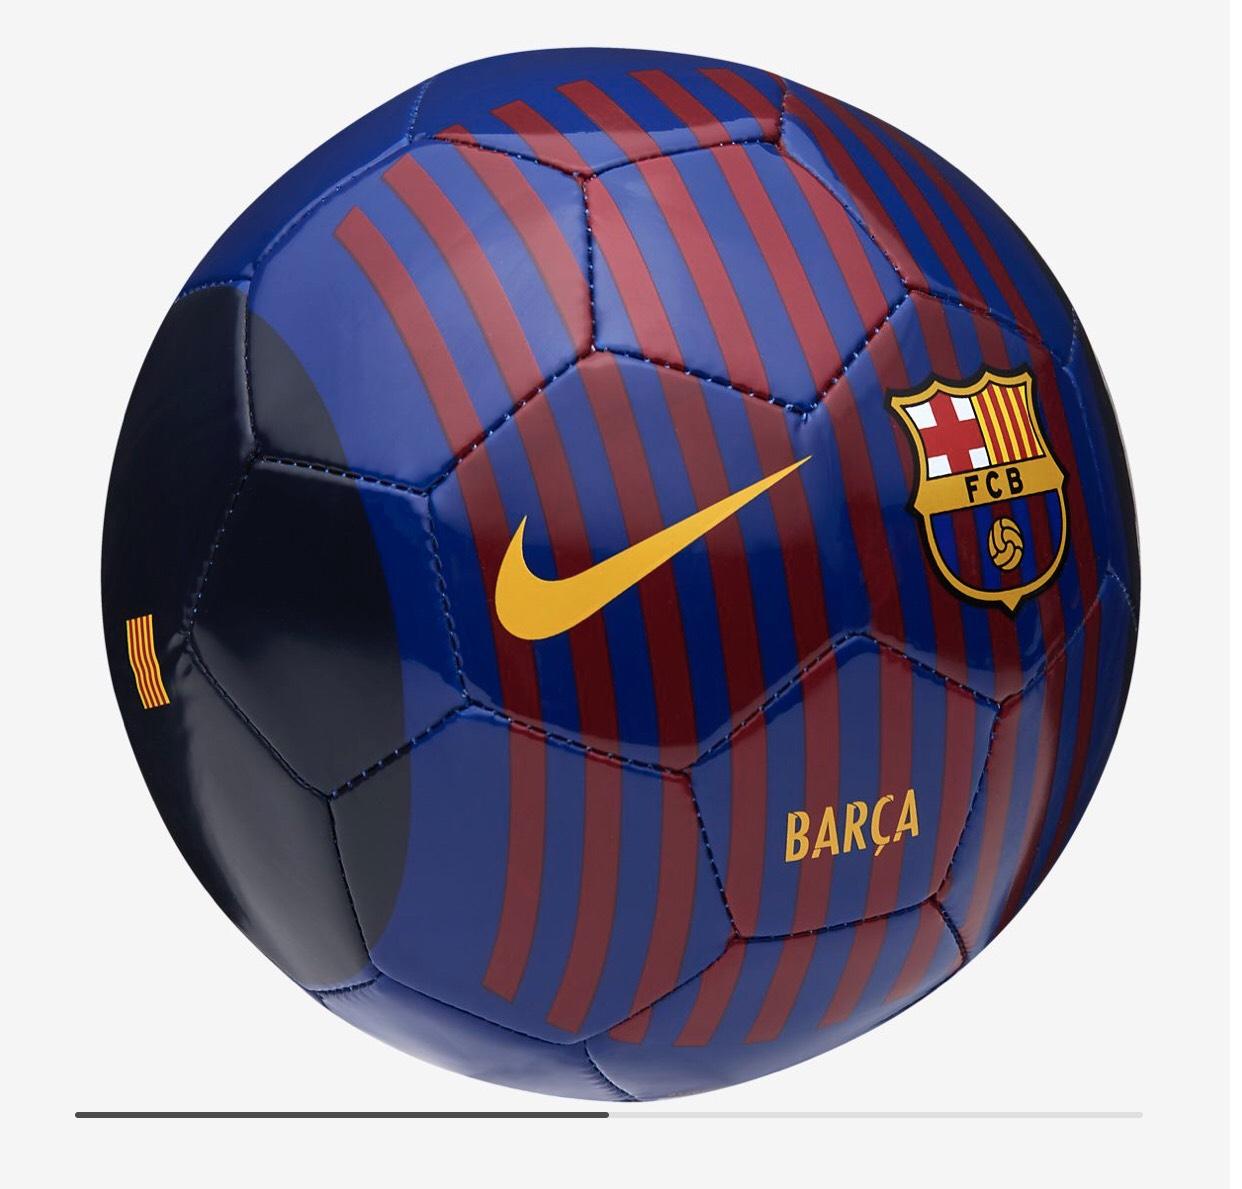 Barcelona Football Size 1 @ Nike store - £5.18